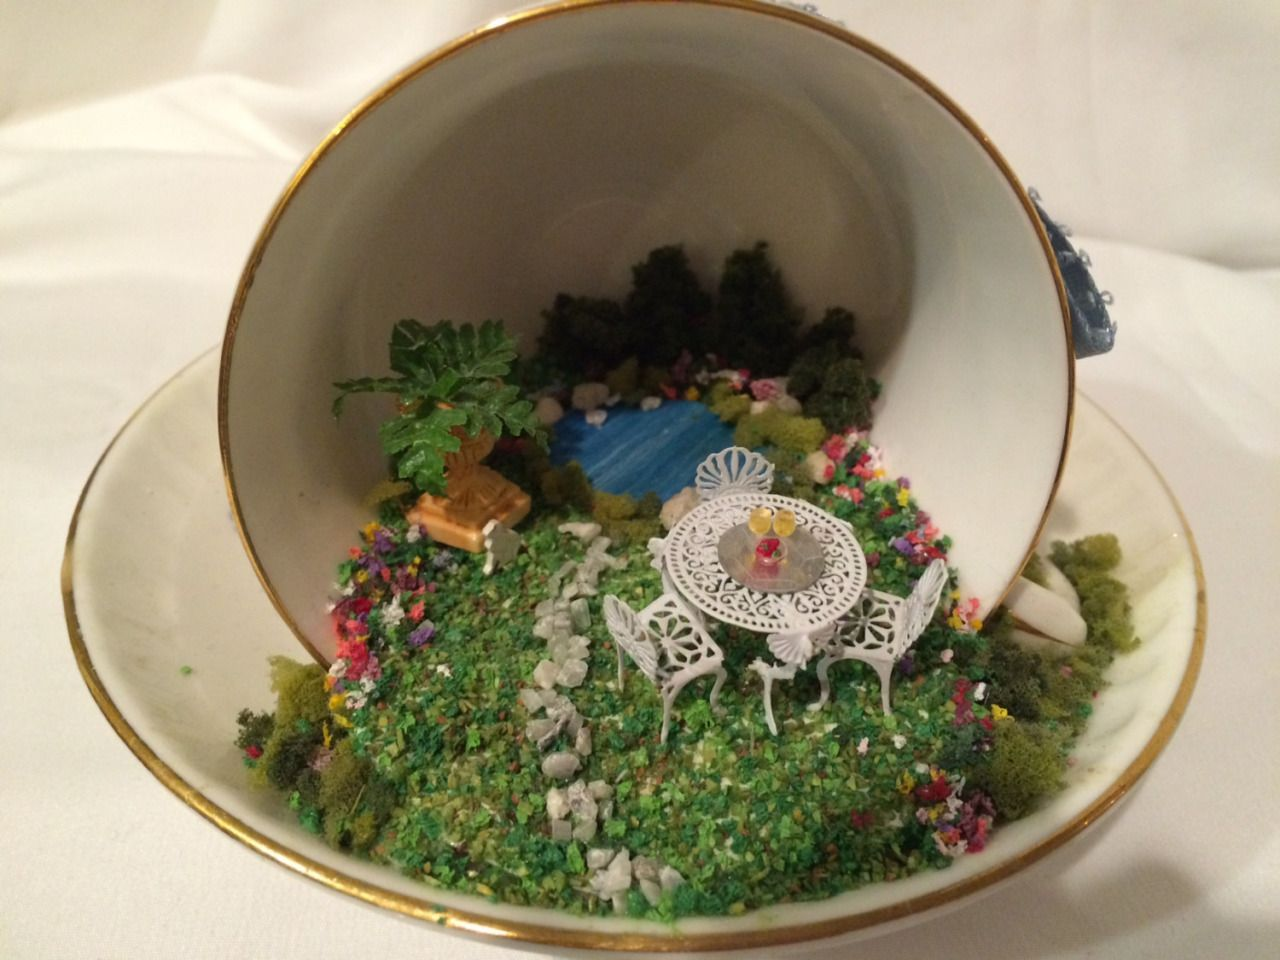 Miniature Inside A Tea Cup by MiniEstates (74.95 USD) http://ift.tt/1Gl6uSl